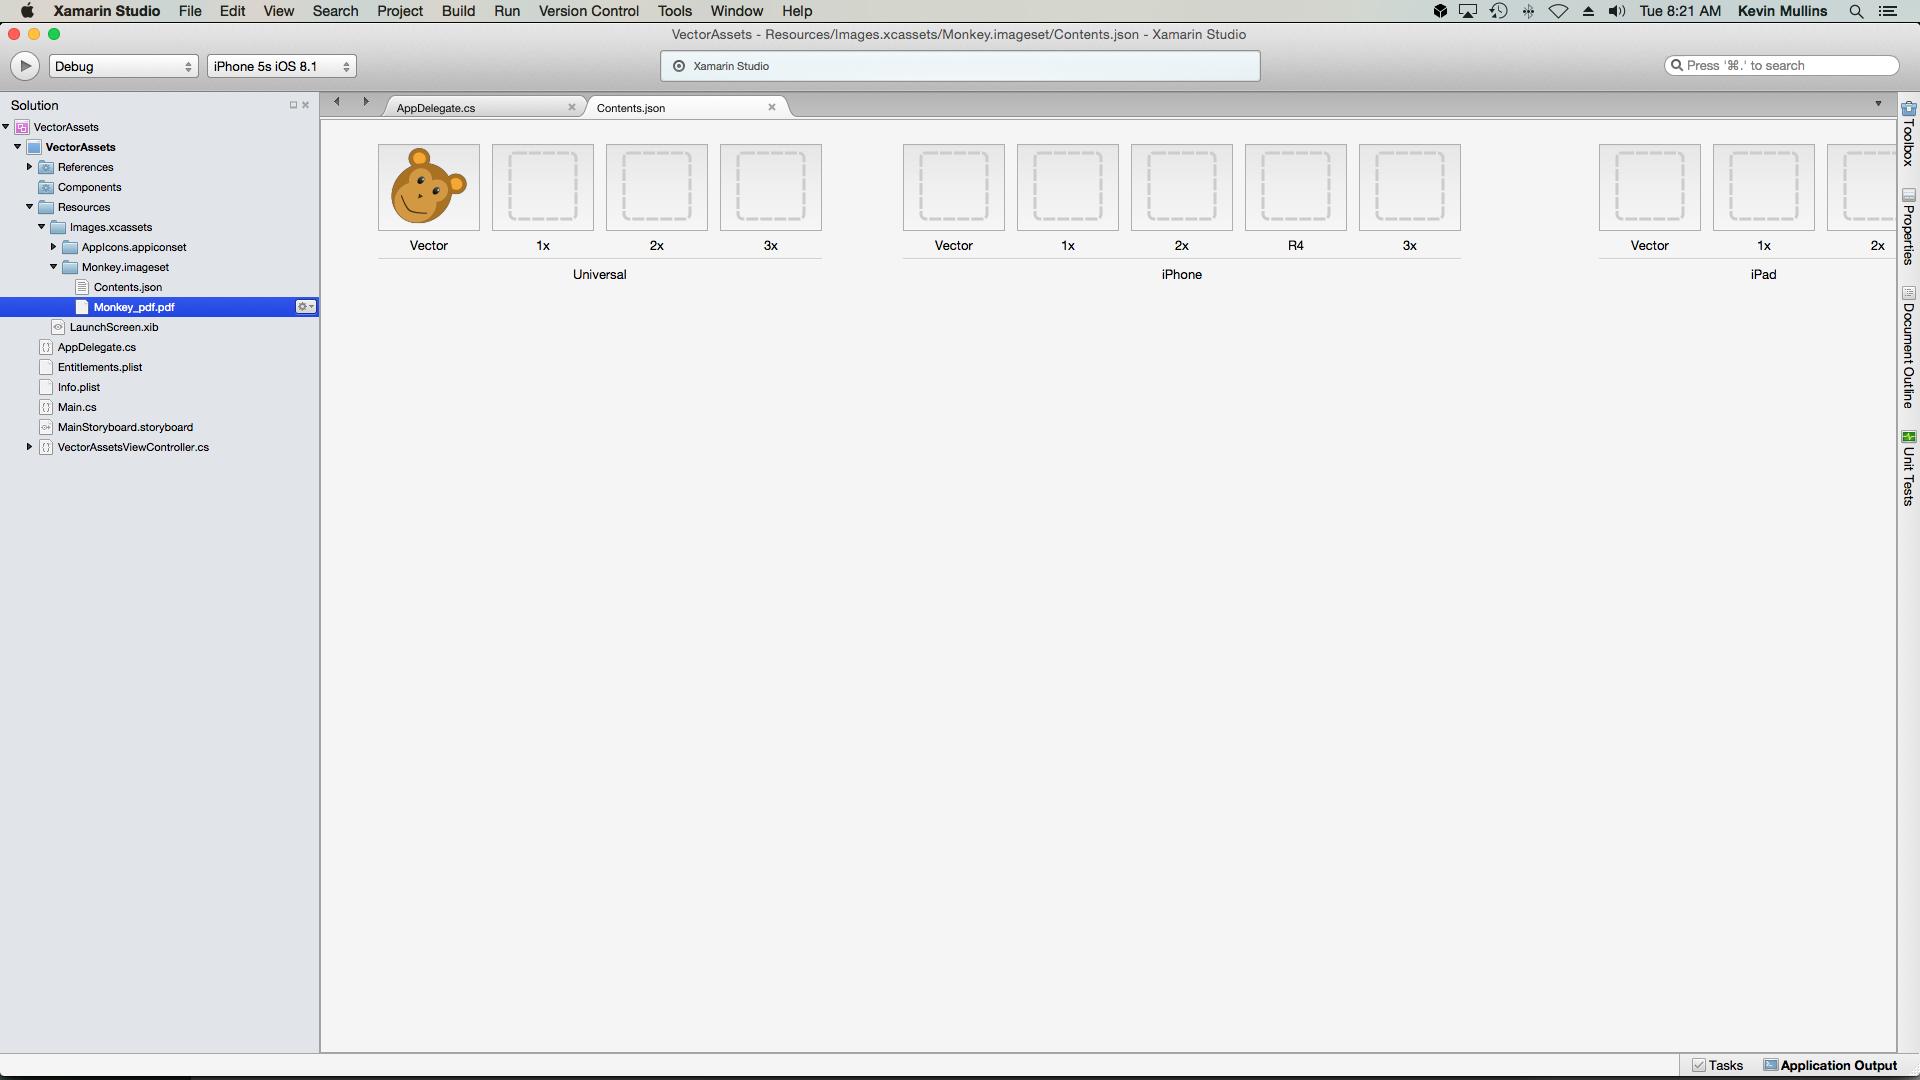 Adding SVG file in Resources folder causes Xamarin designer